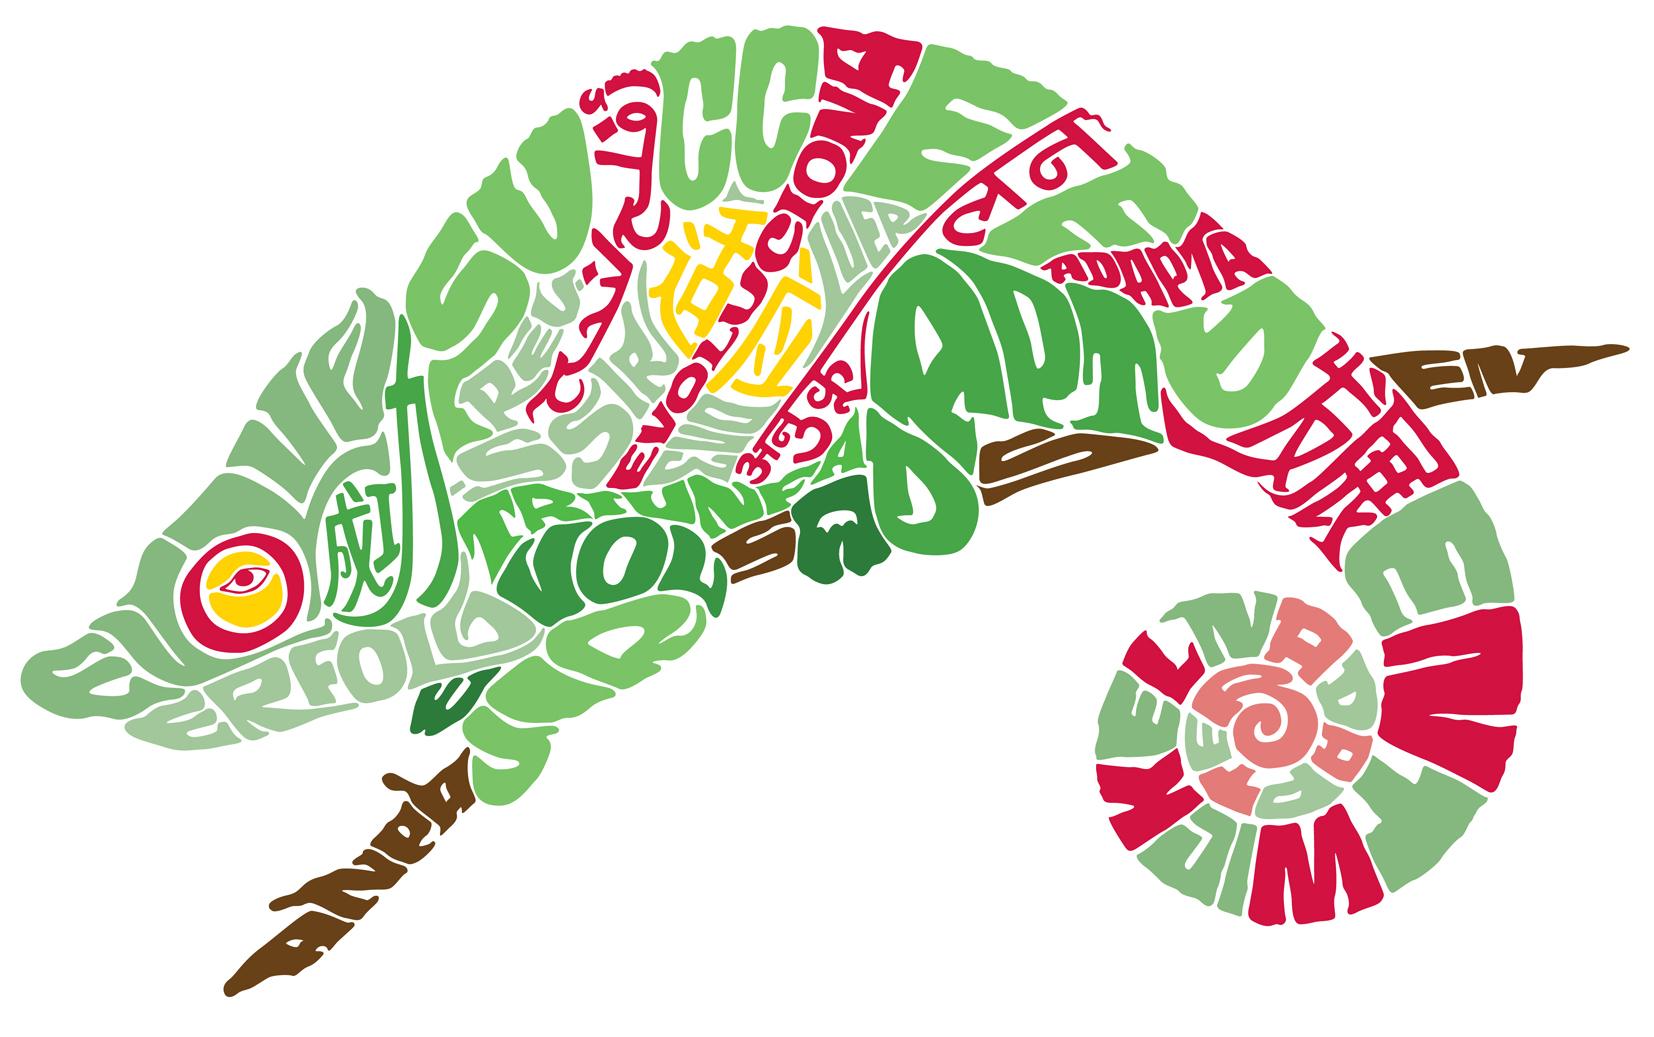 Future Of News >> Futurestep Chameleon - Oscar Wilson - Debut Art